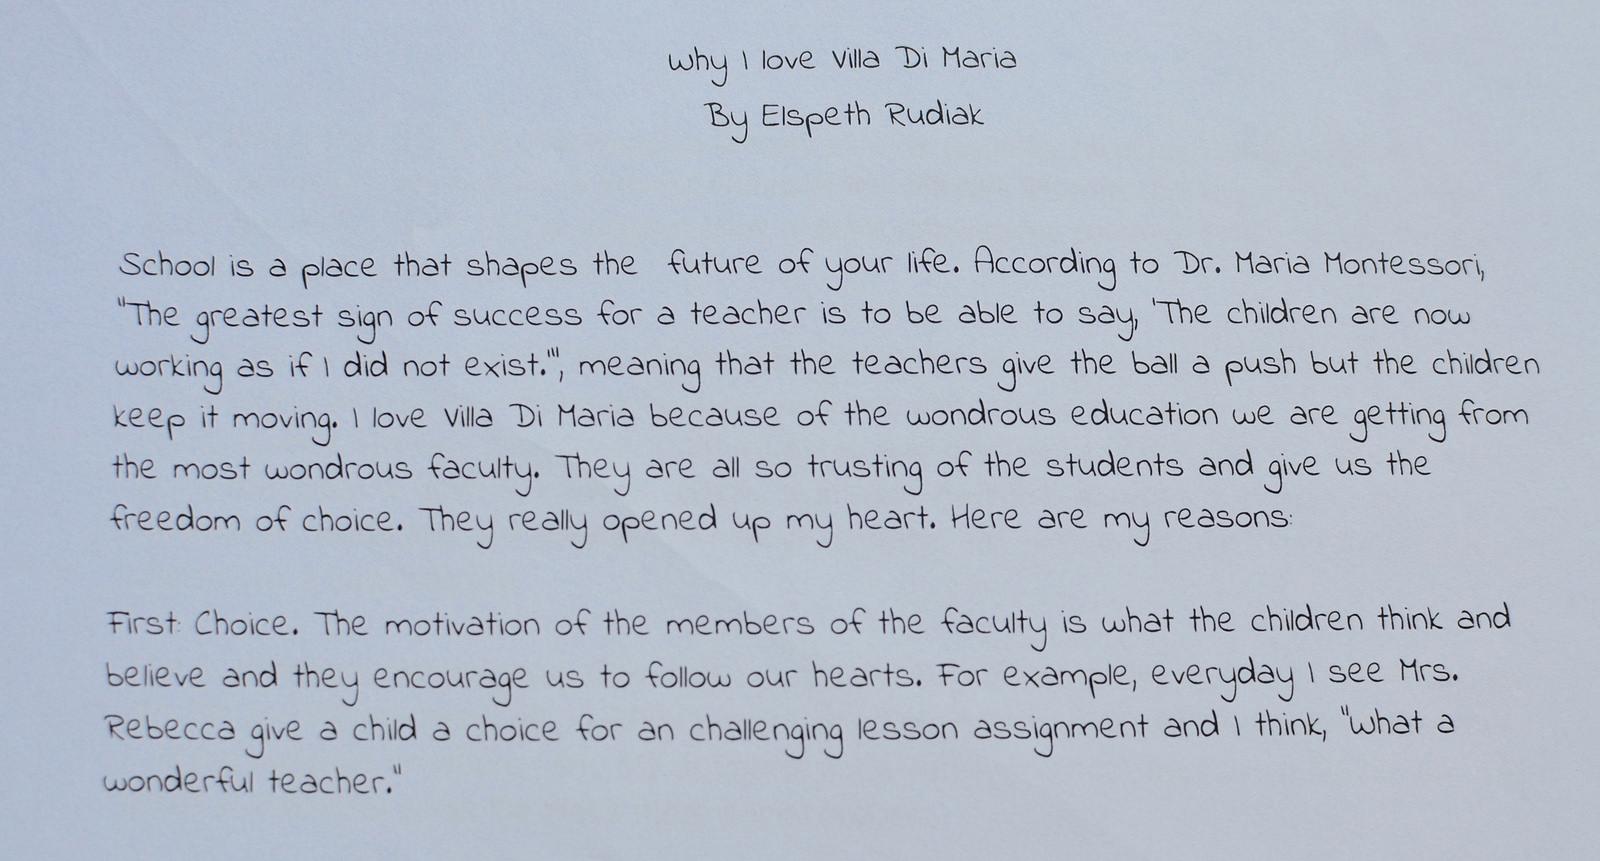 009 Essay Example My School 41204544975 662945095a H Amazing Dream For Class 10 In Urdu 1 3 Marathi Full